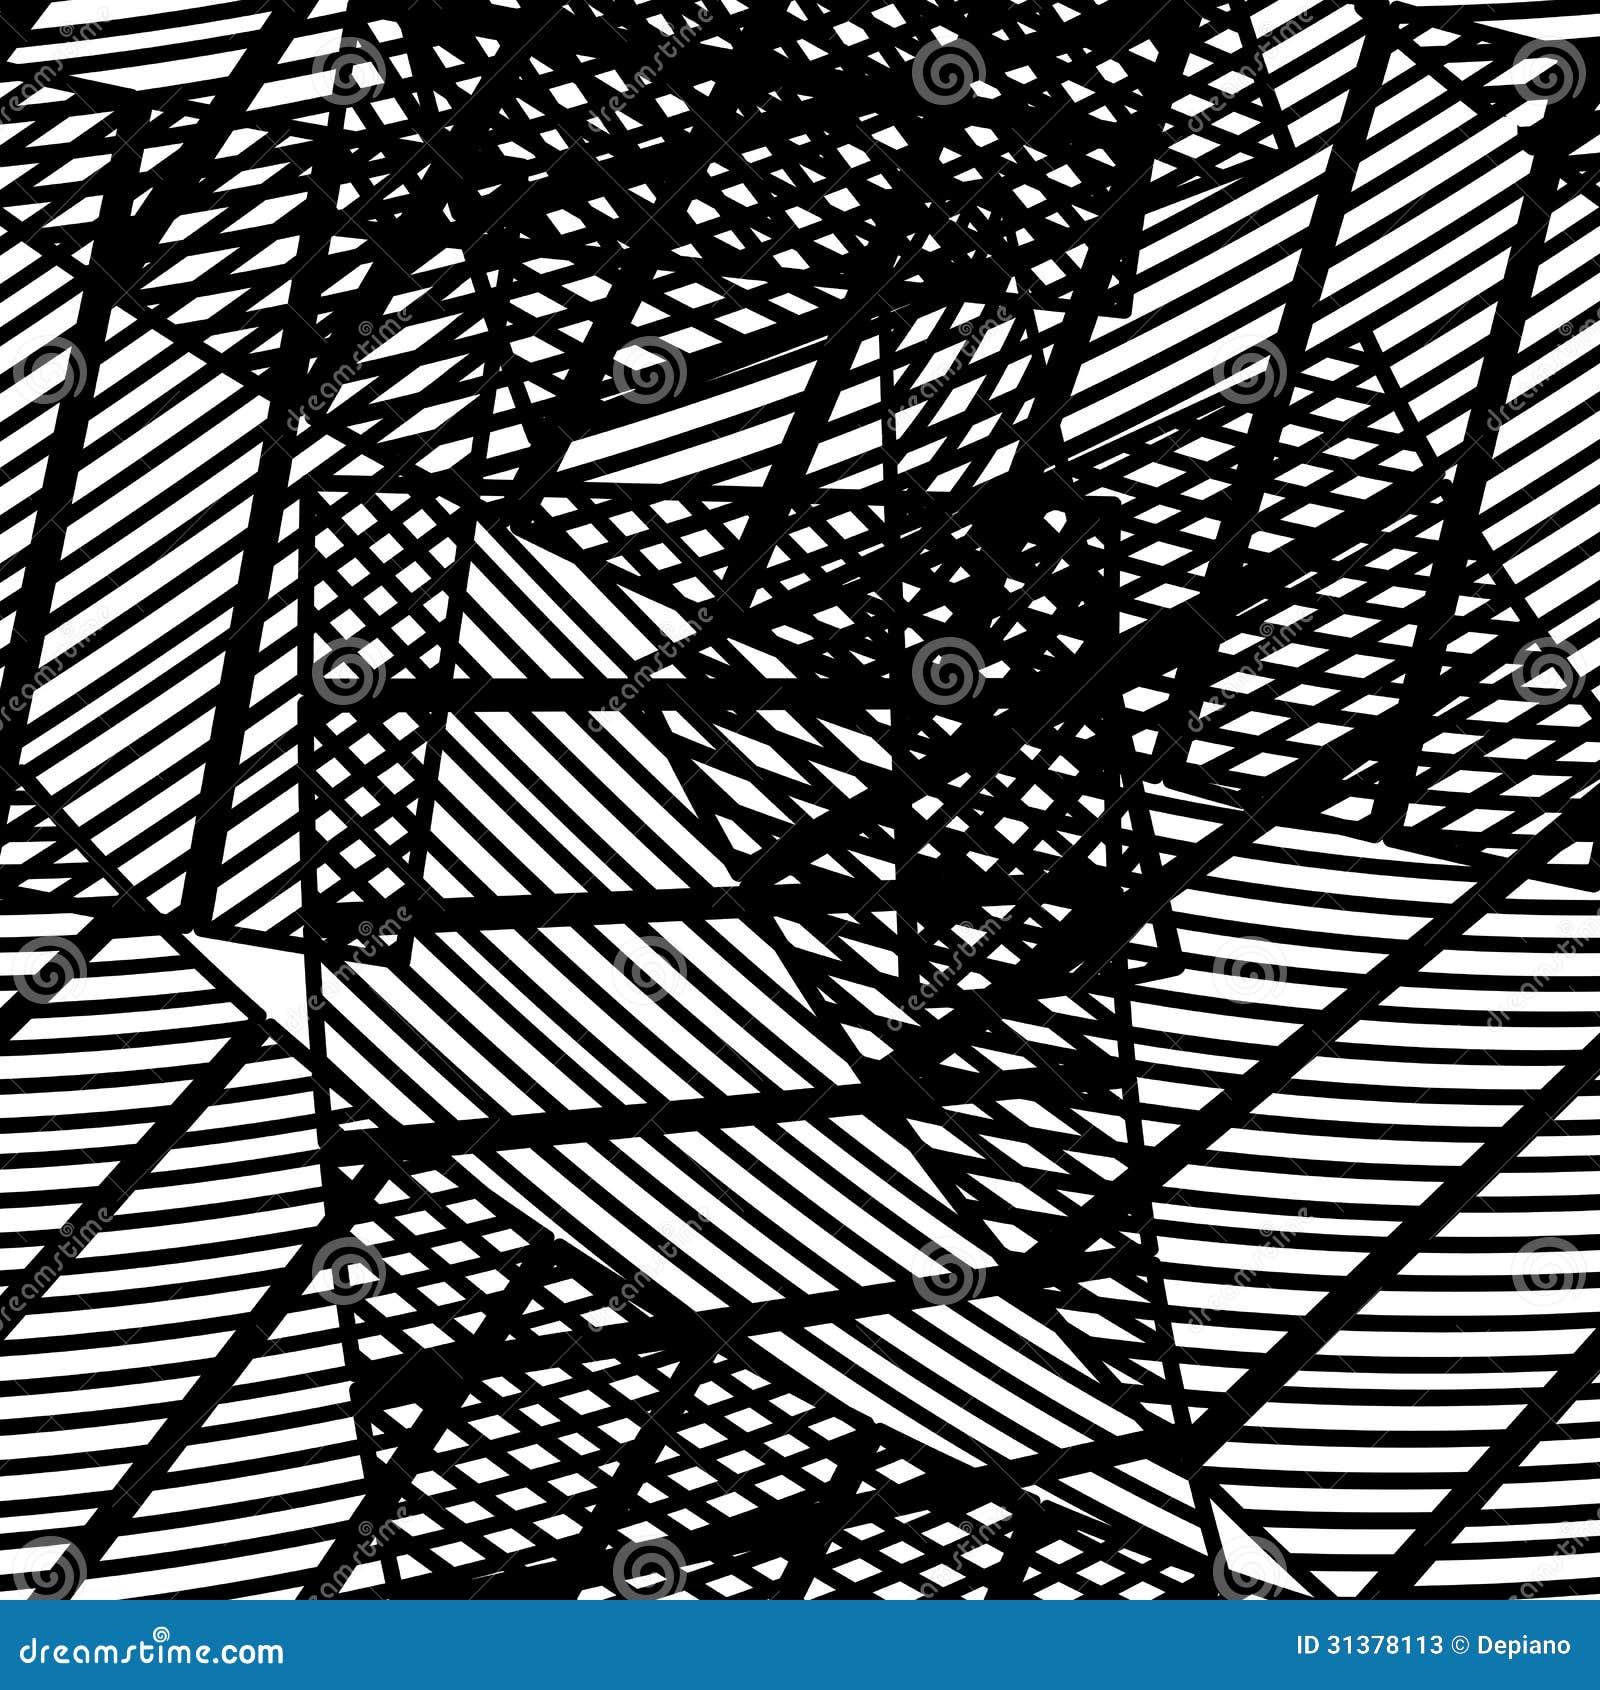 Seamless Abstract Geometric Pattern Stock Photos - Image ...